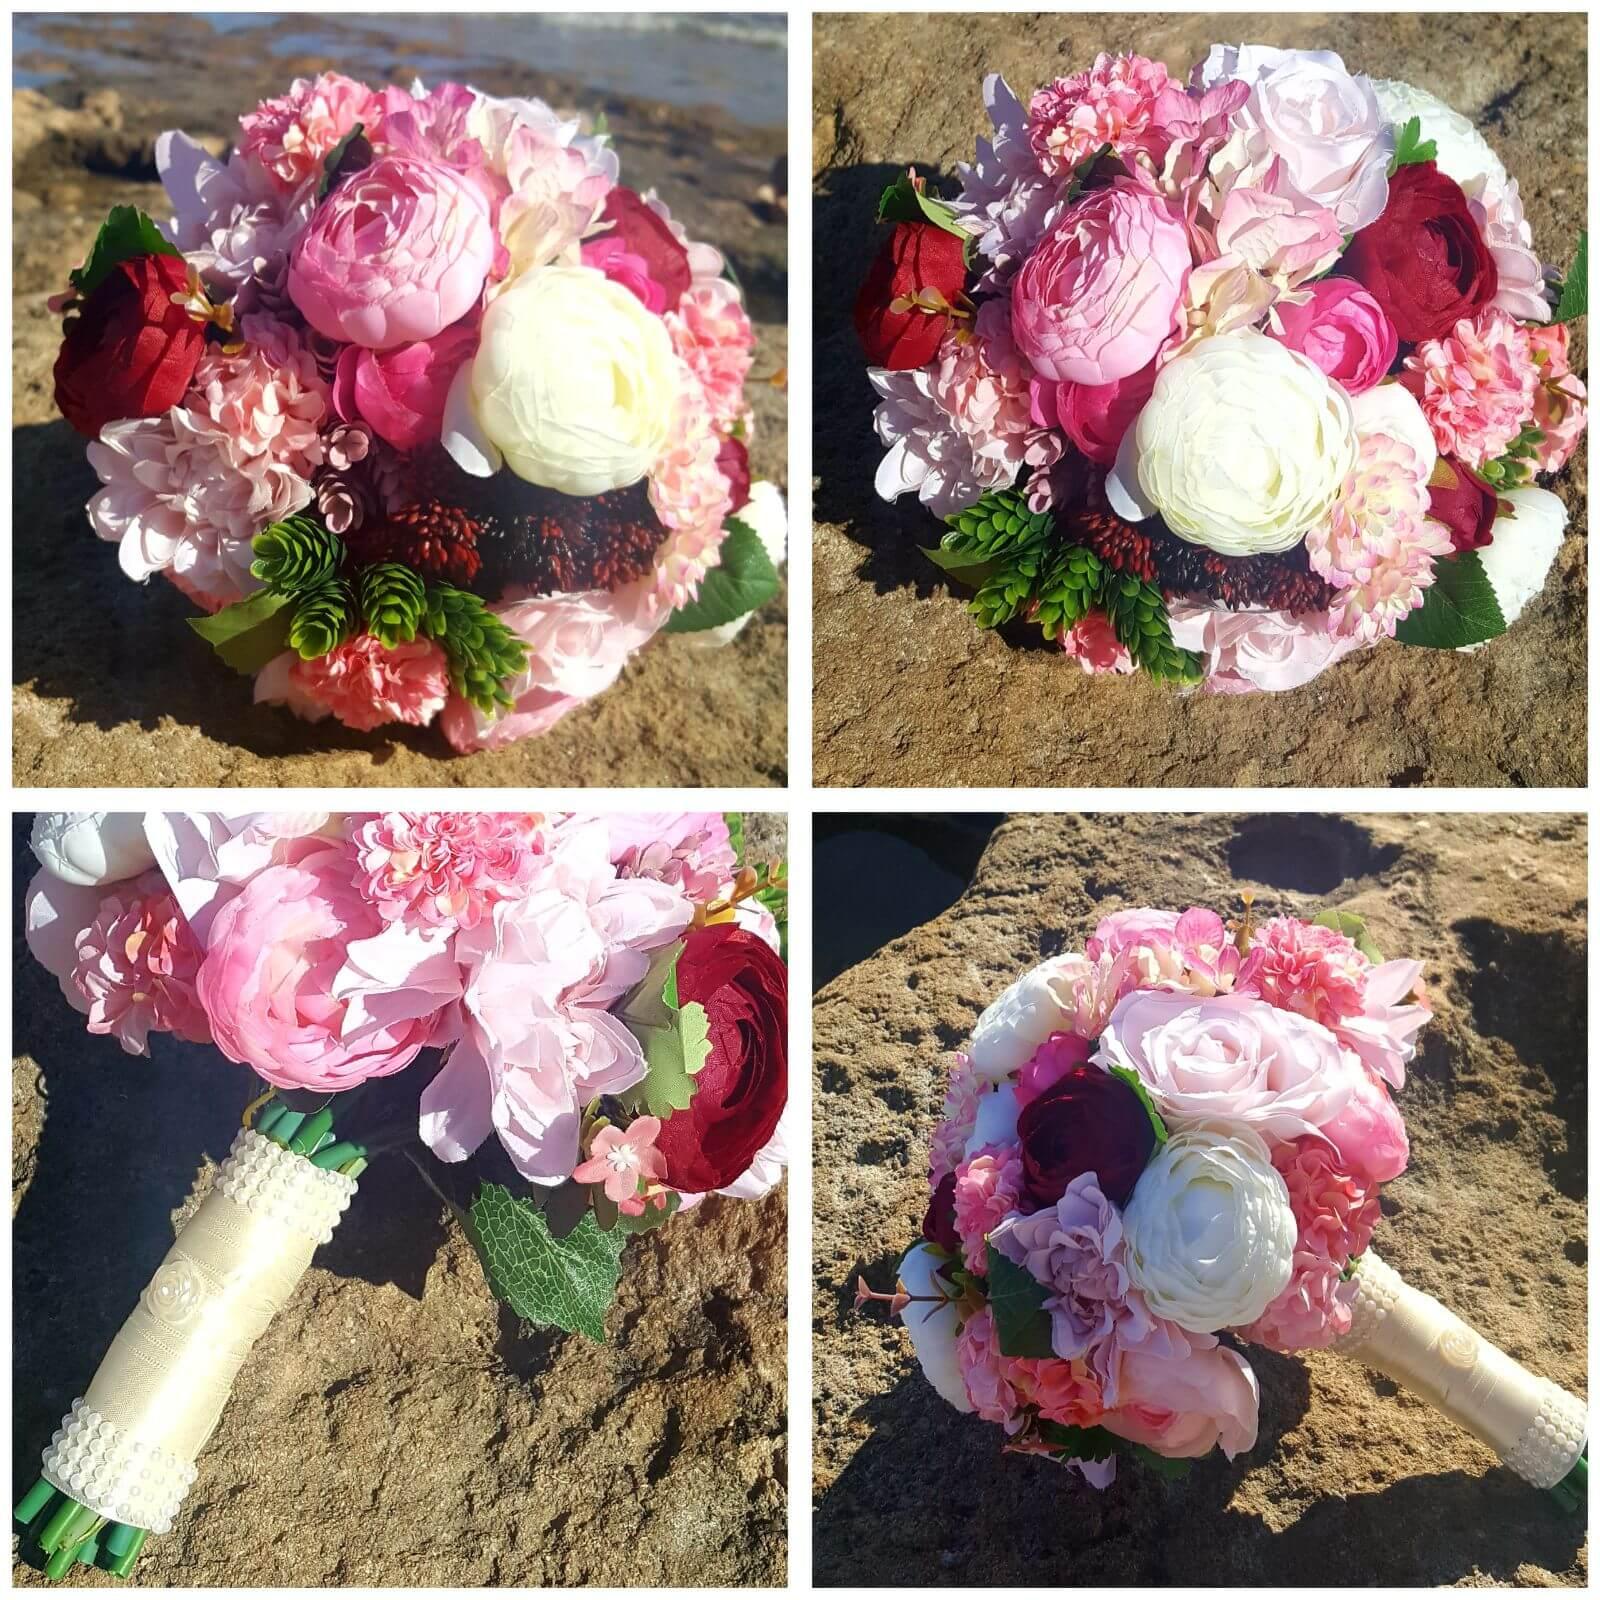 Ramos de boda copas personalizadas - 8b4b4473 e4bc 4100 8a87 3b85a9c360cf - Página de inicio